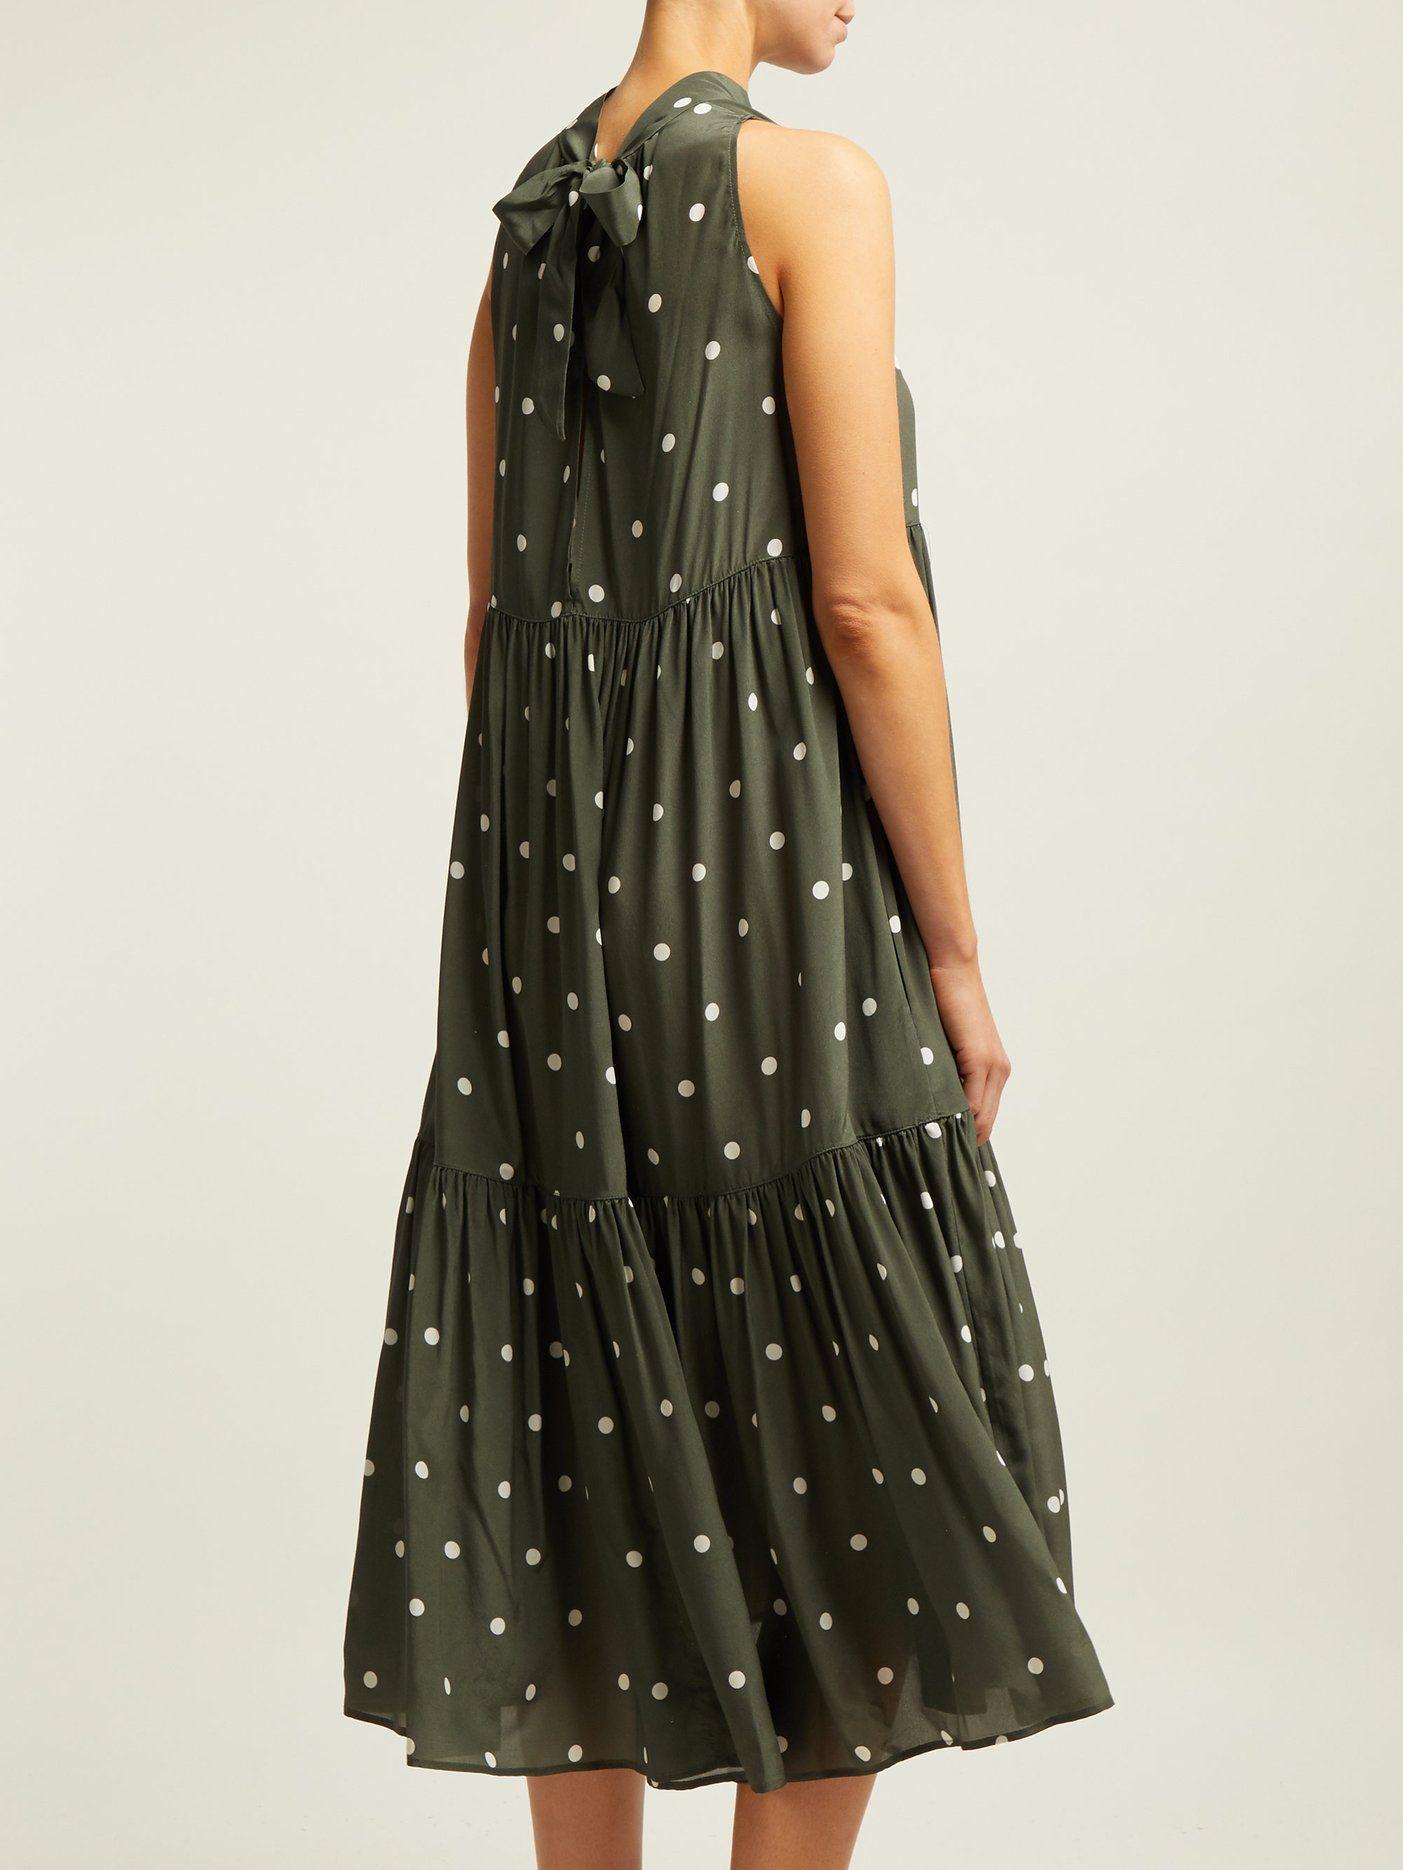 12+ Asceno polka dot dress inspirations